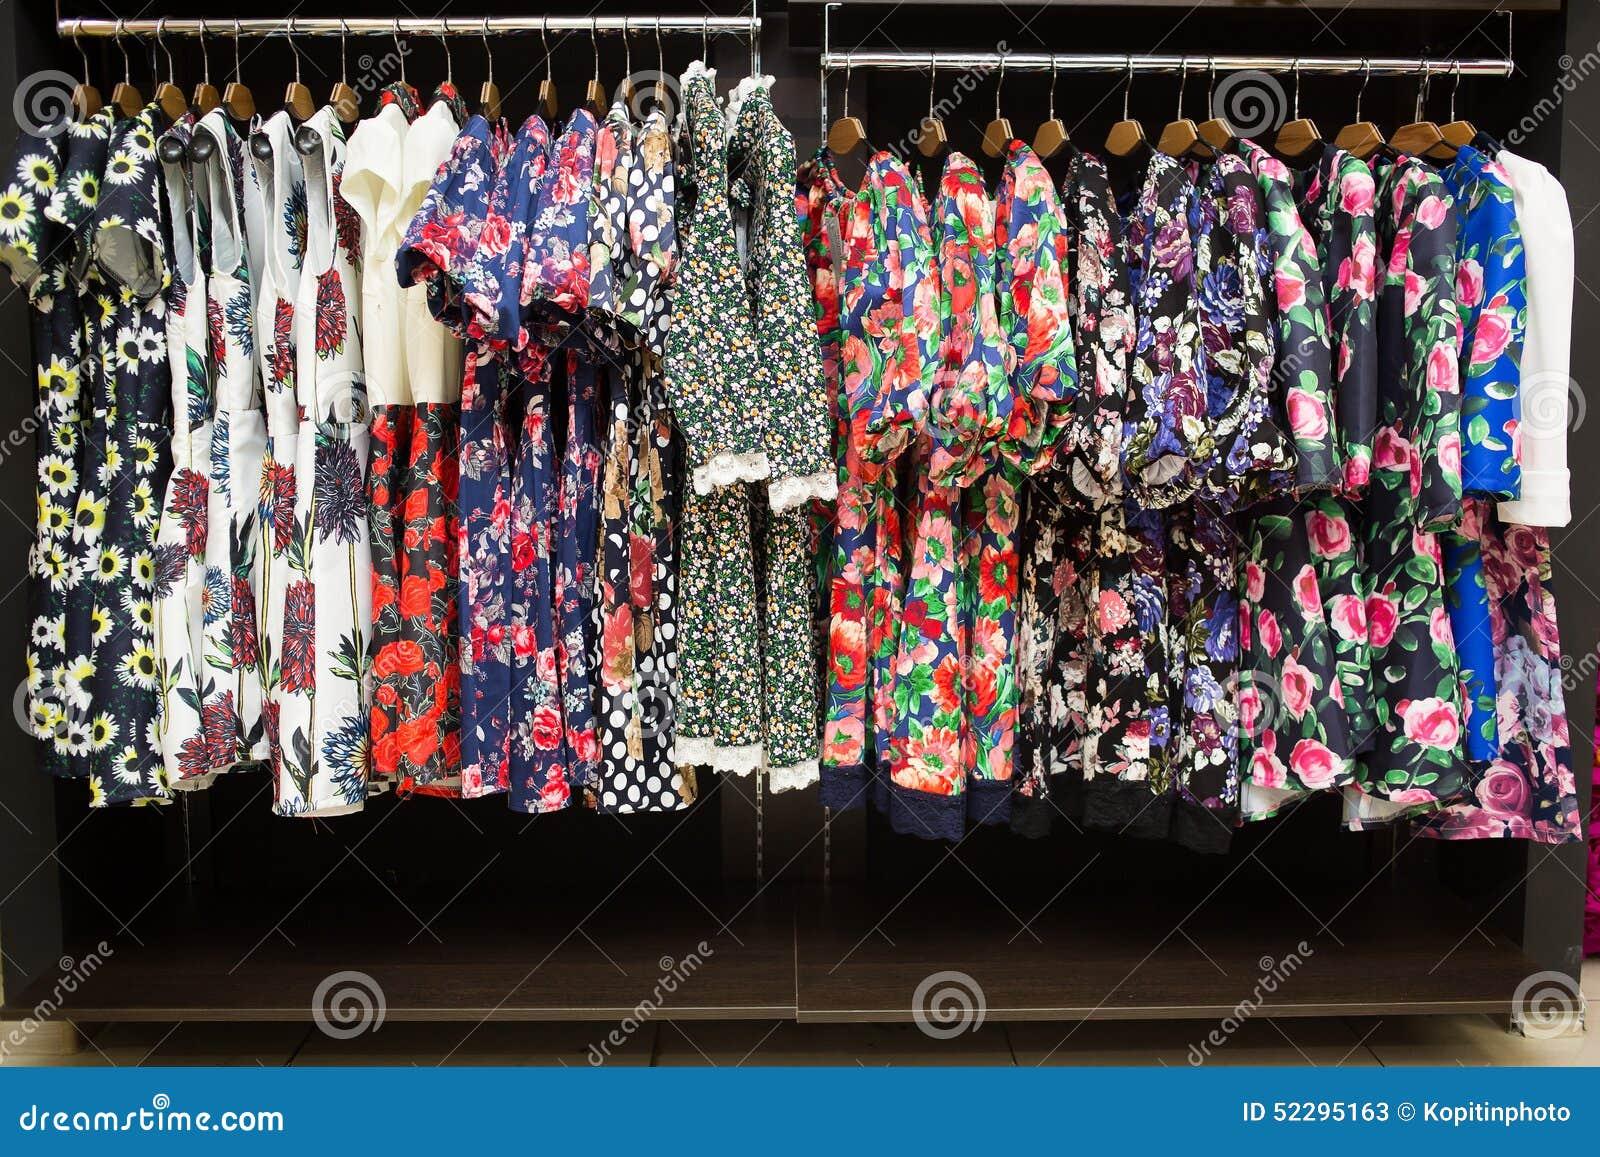 Women s dresses on hangers in a retail shop